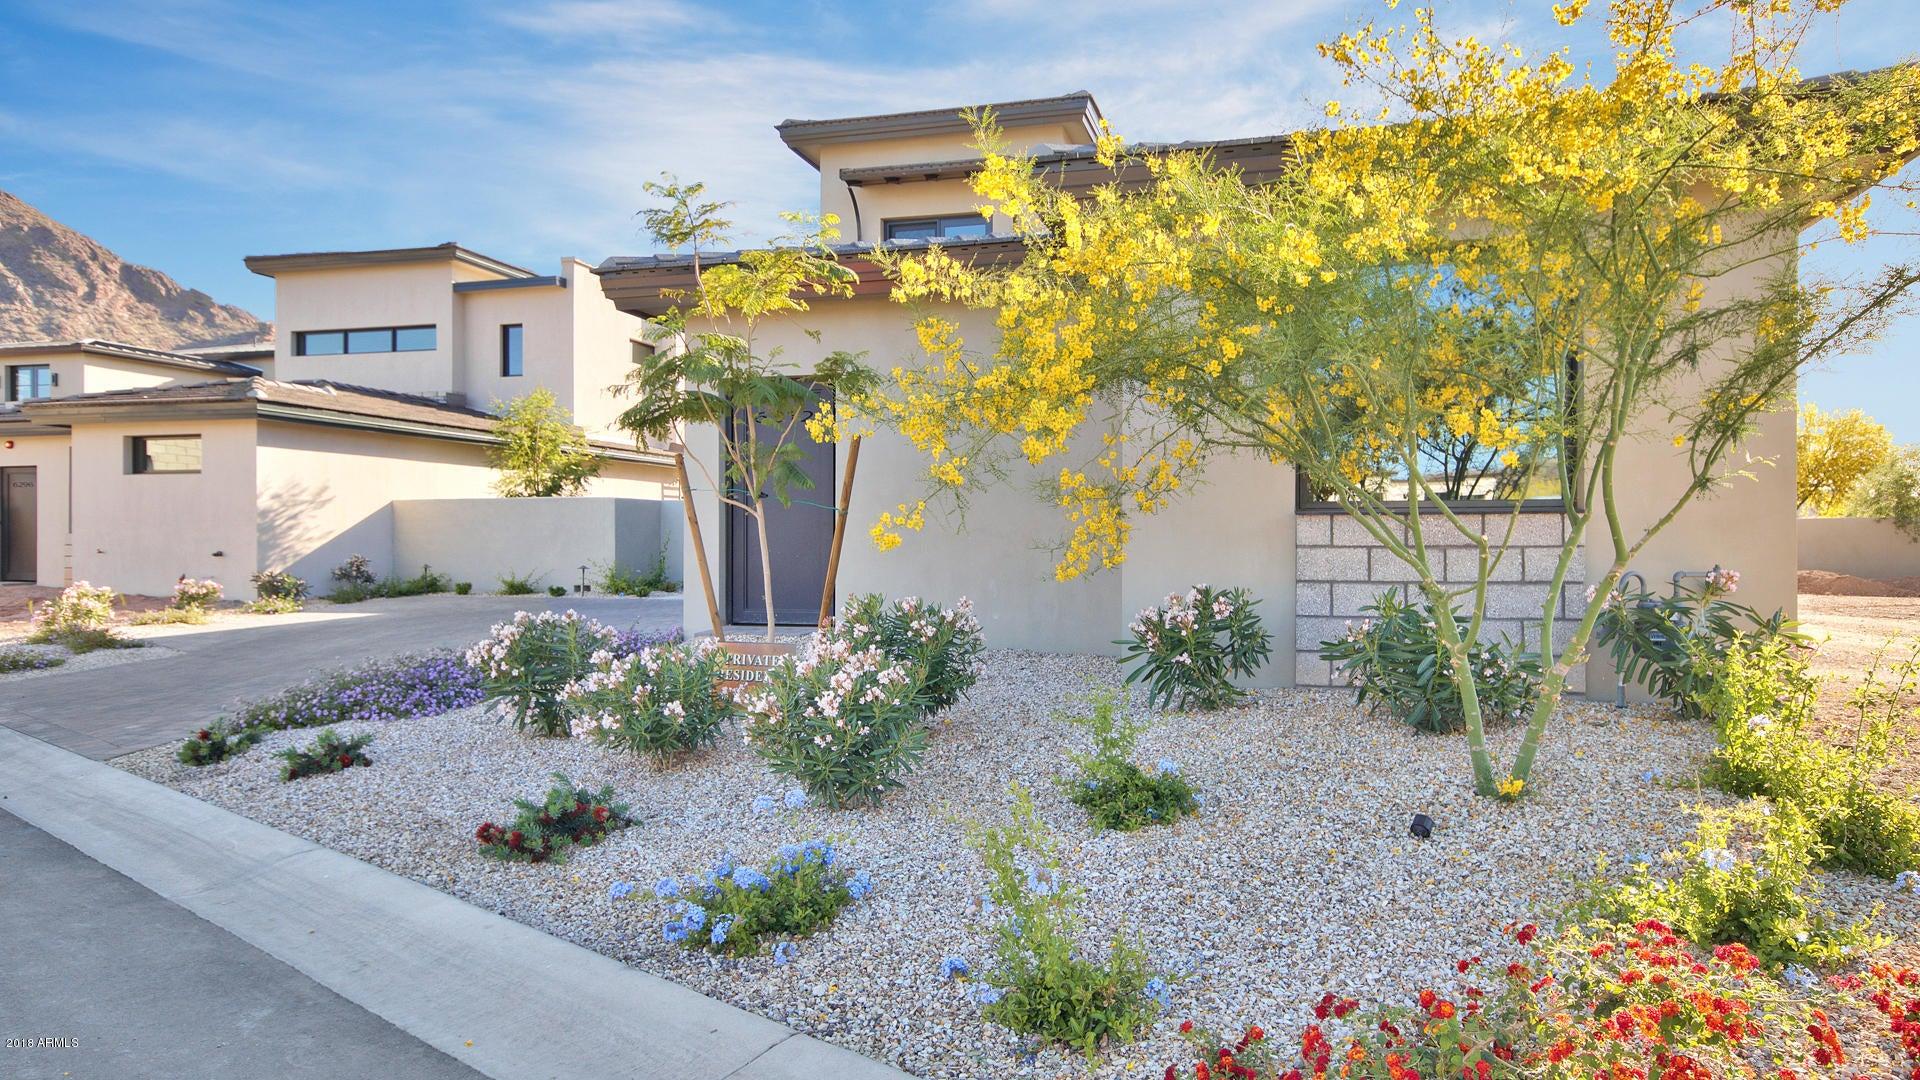 6312 N LOST DUTCHMAN Drive, Paradise Valley AZ 85253